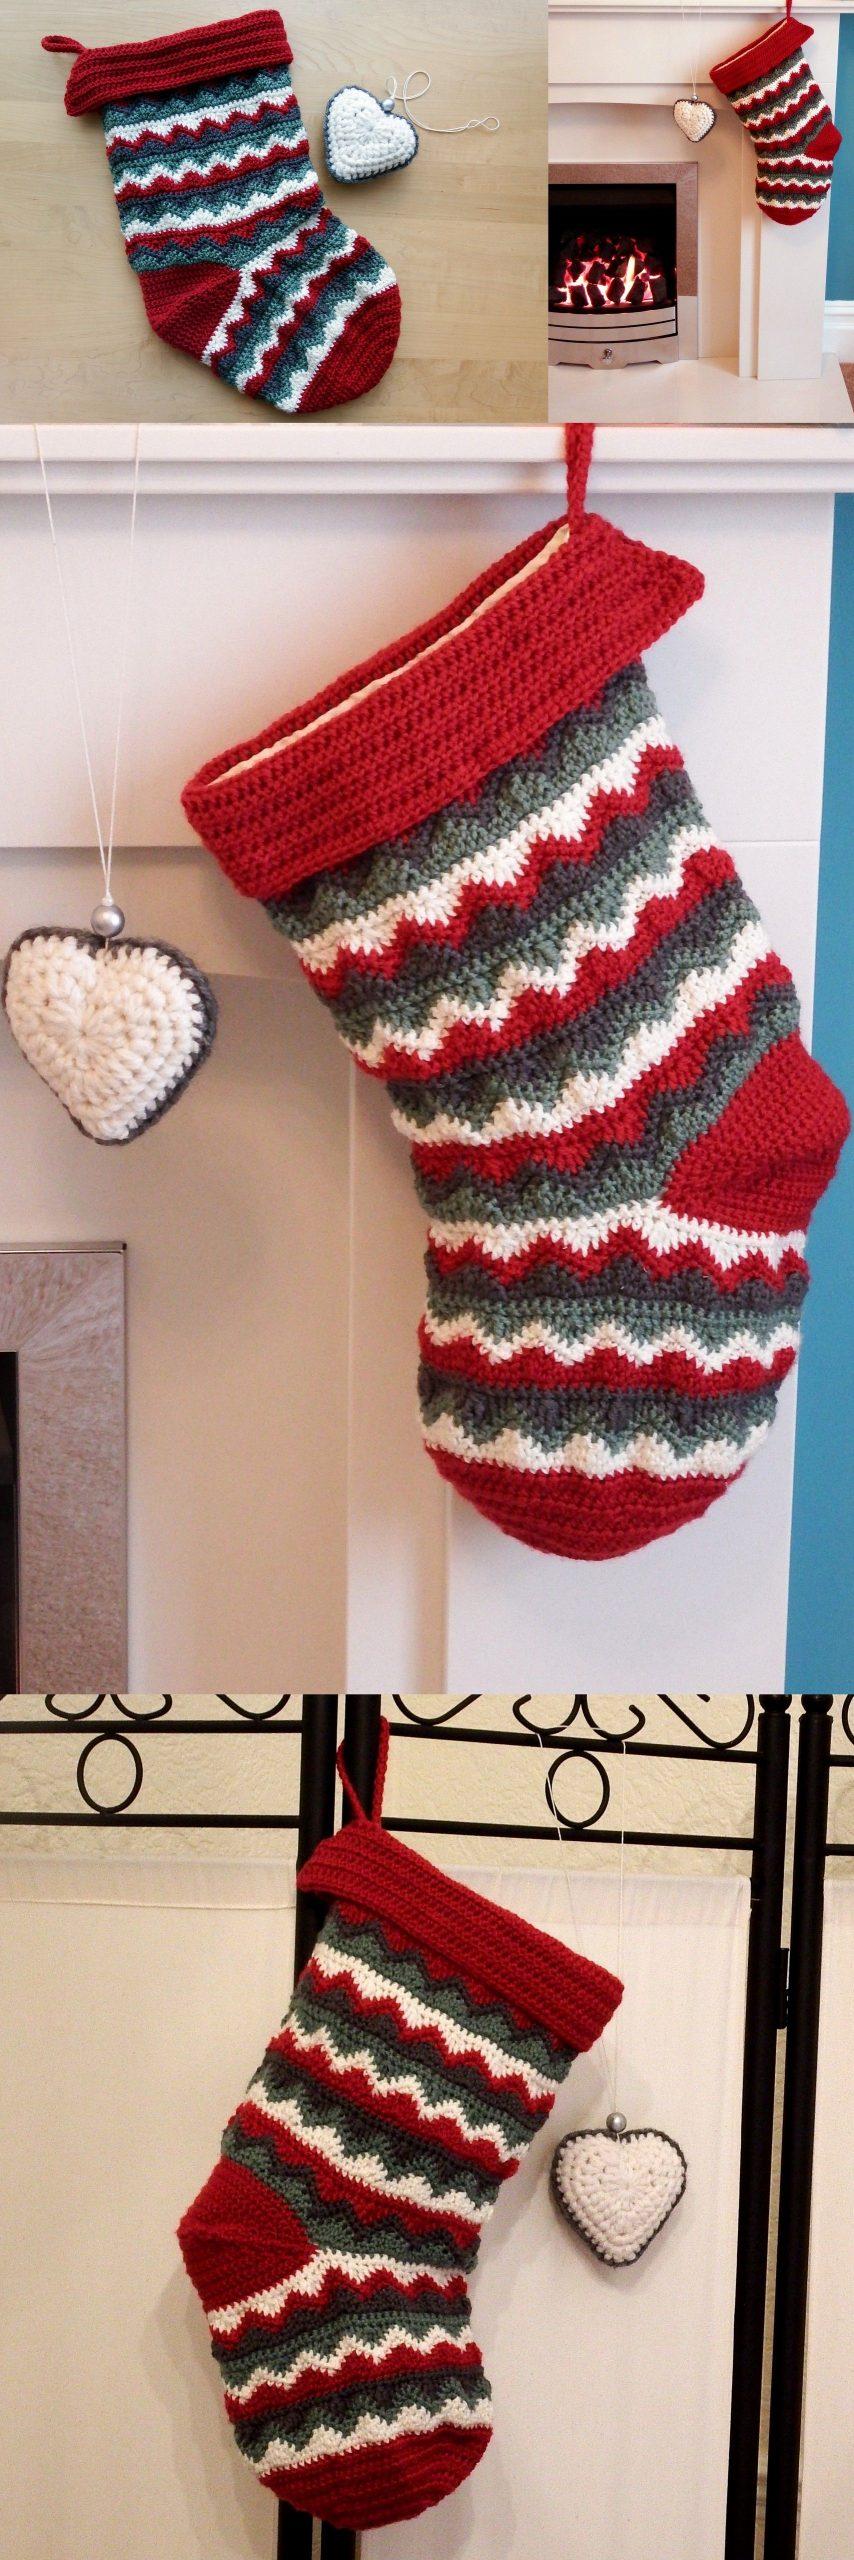 Home made zigzag Christmas Stocking – free crochet pattern!